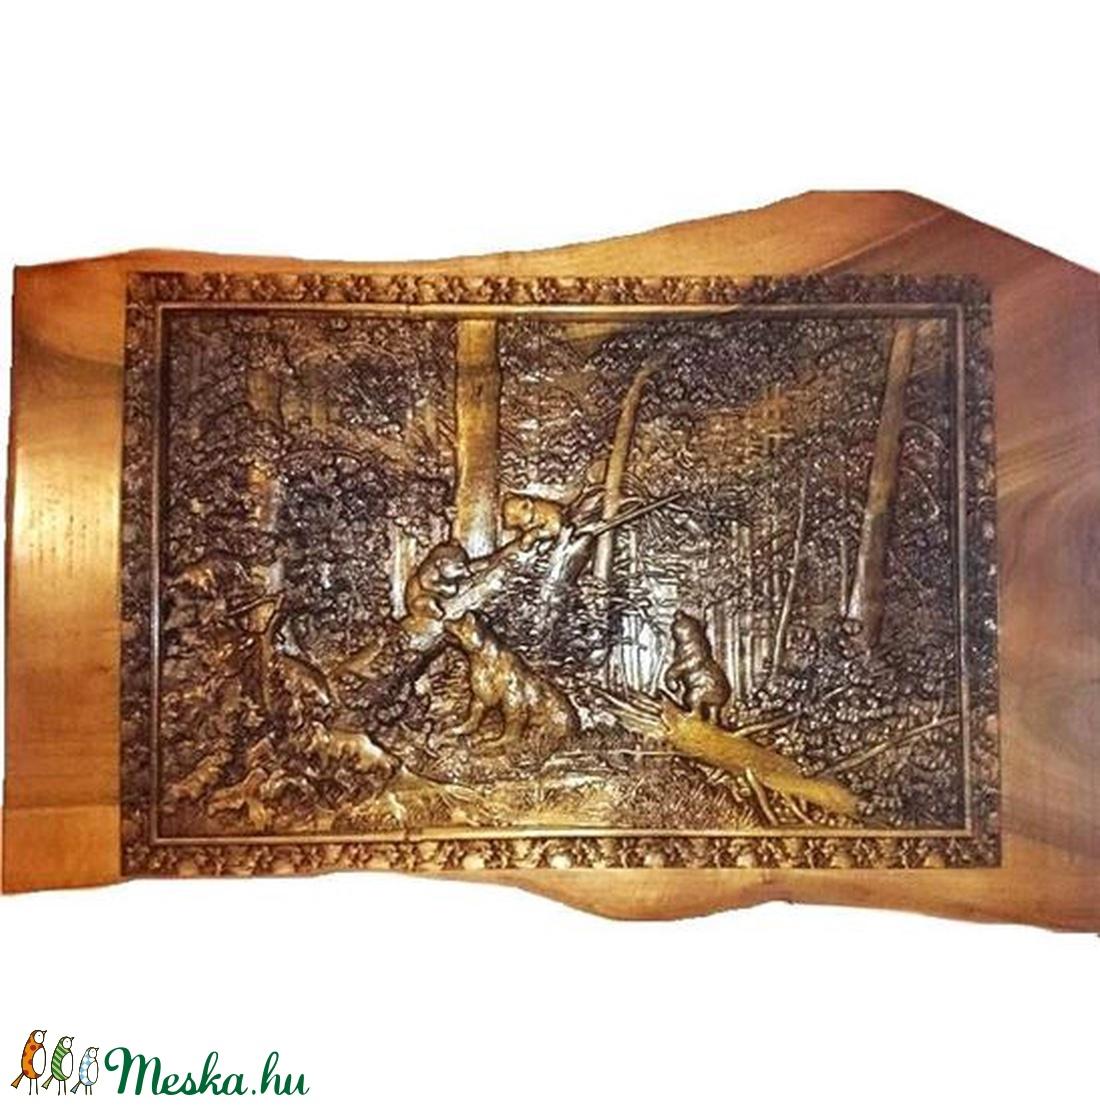 Erdei kép medvékkel (3Dfamuves) - Meska.hu